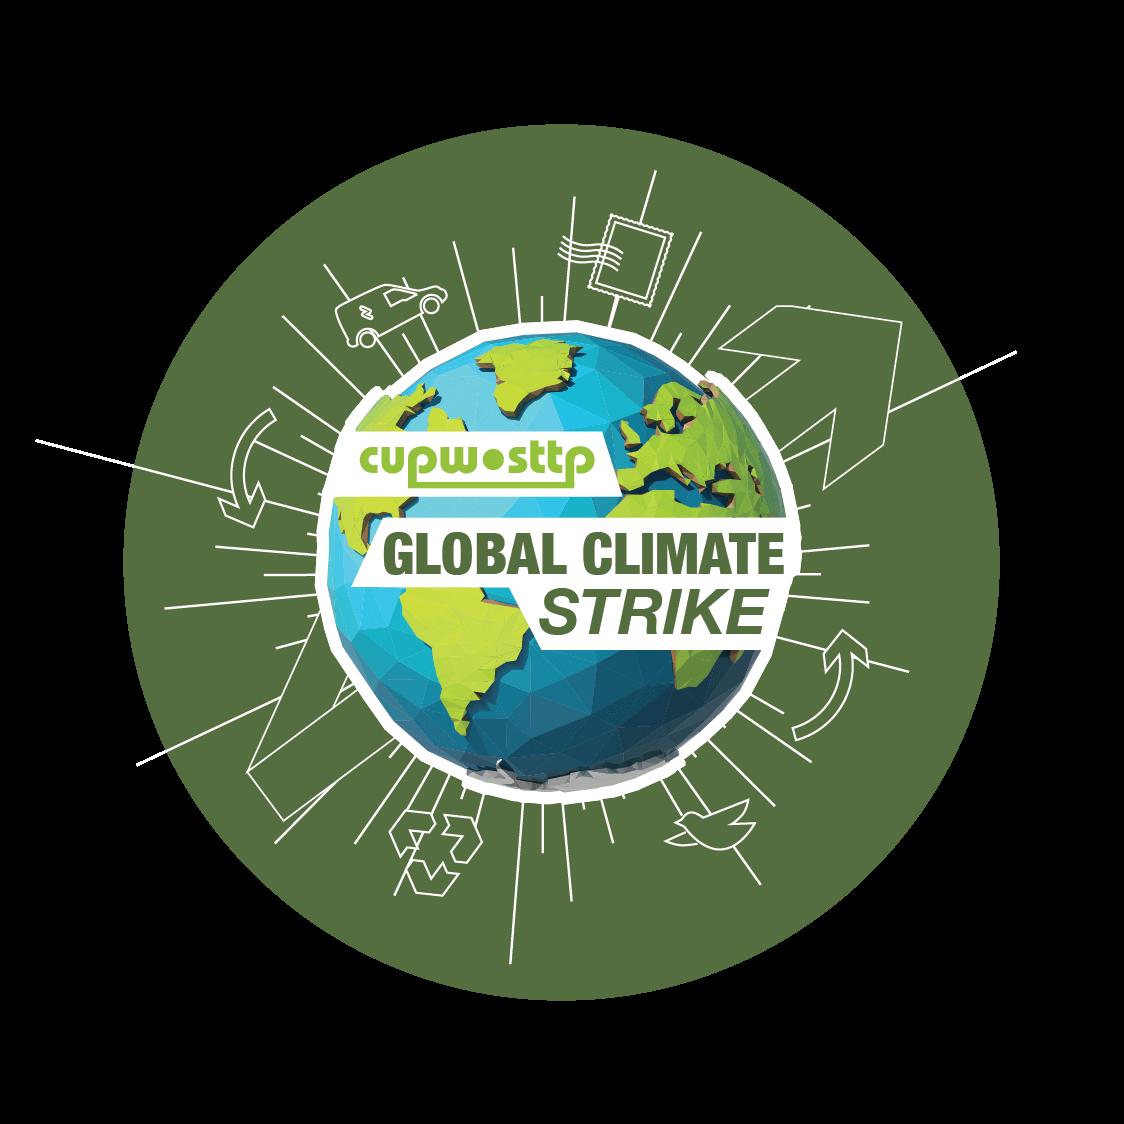 CUPW•STTP Global Climate Strike